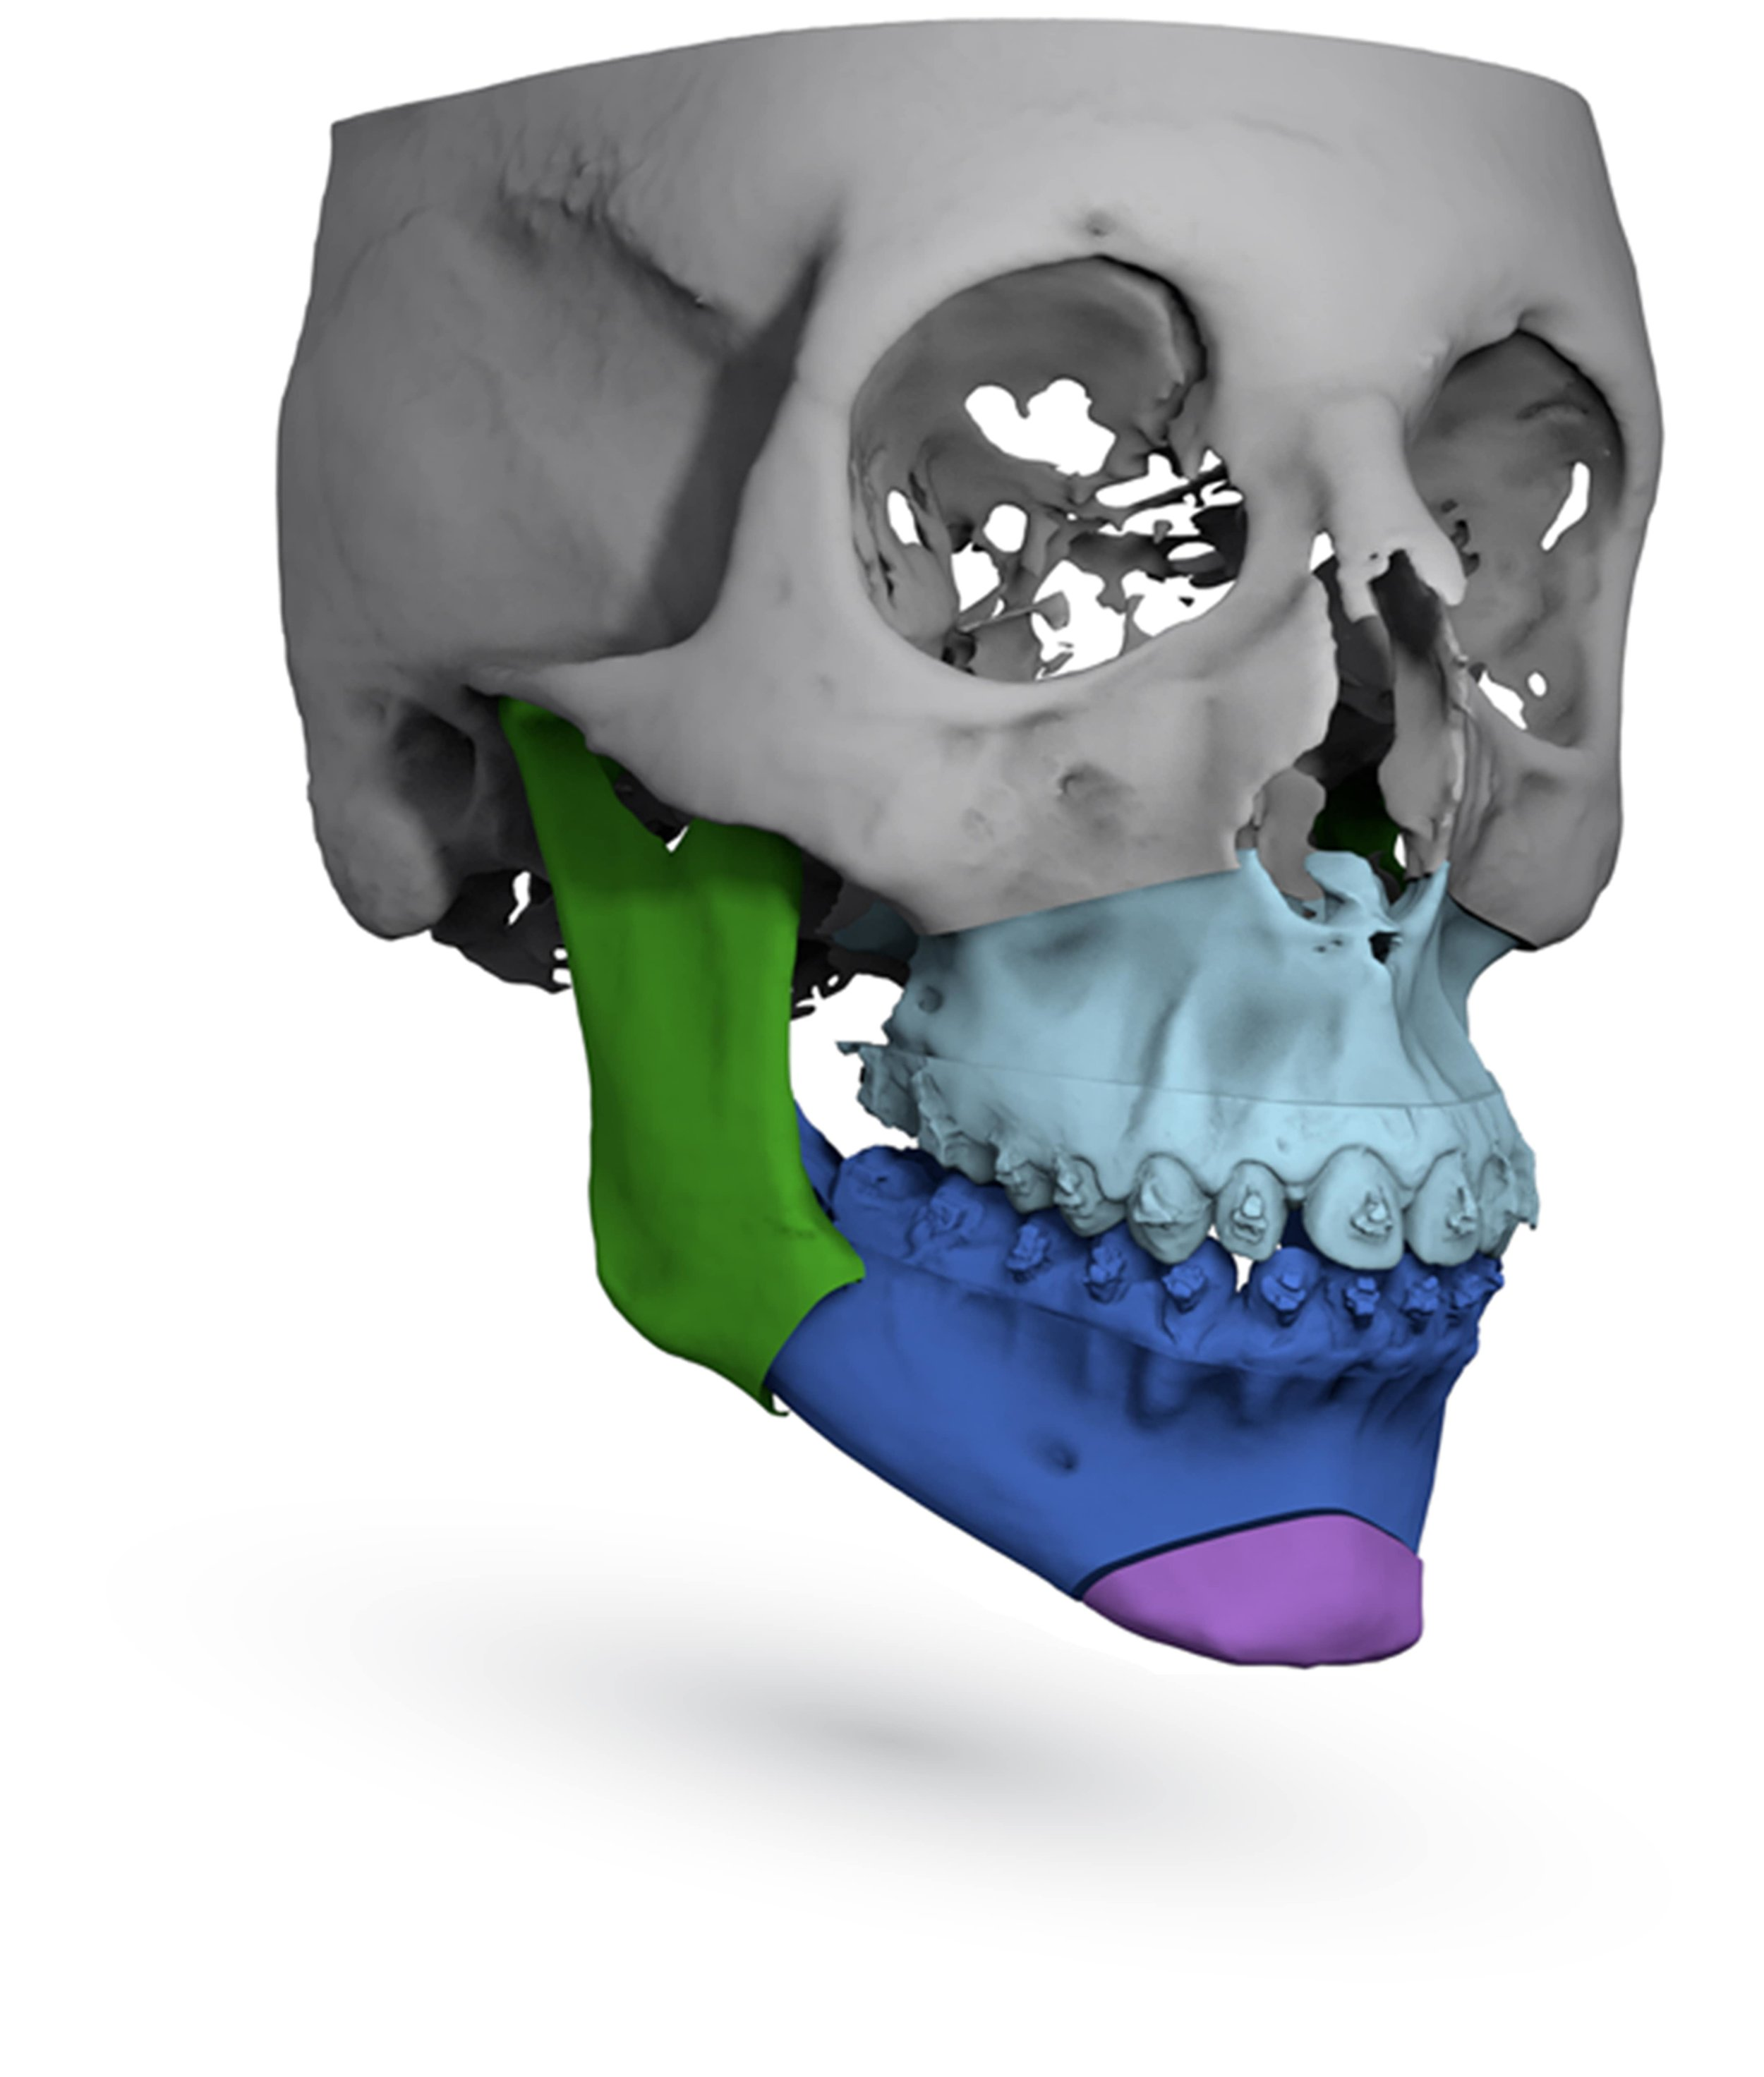 Fully Orthognathic Segmented Skull Image by ImmersiveTouch IVSP